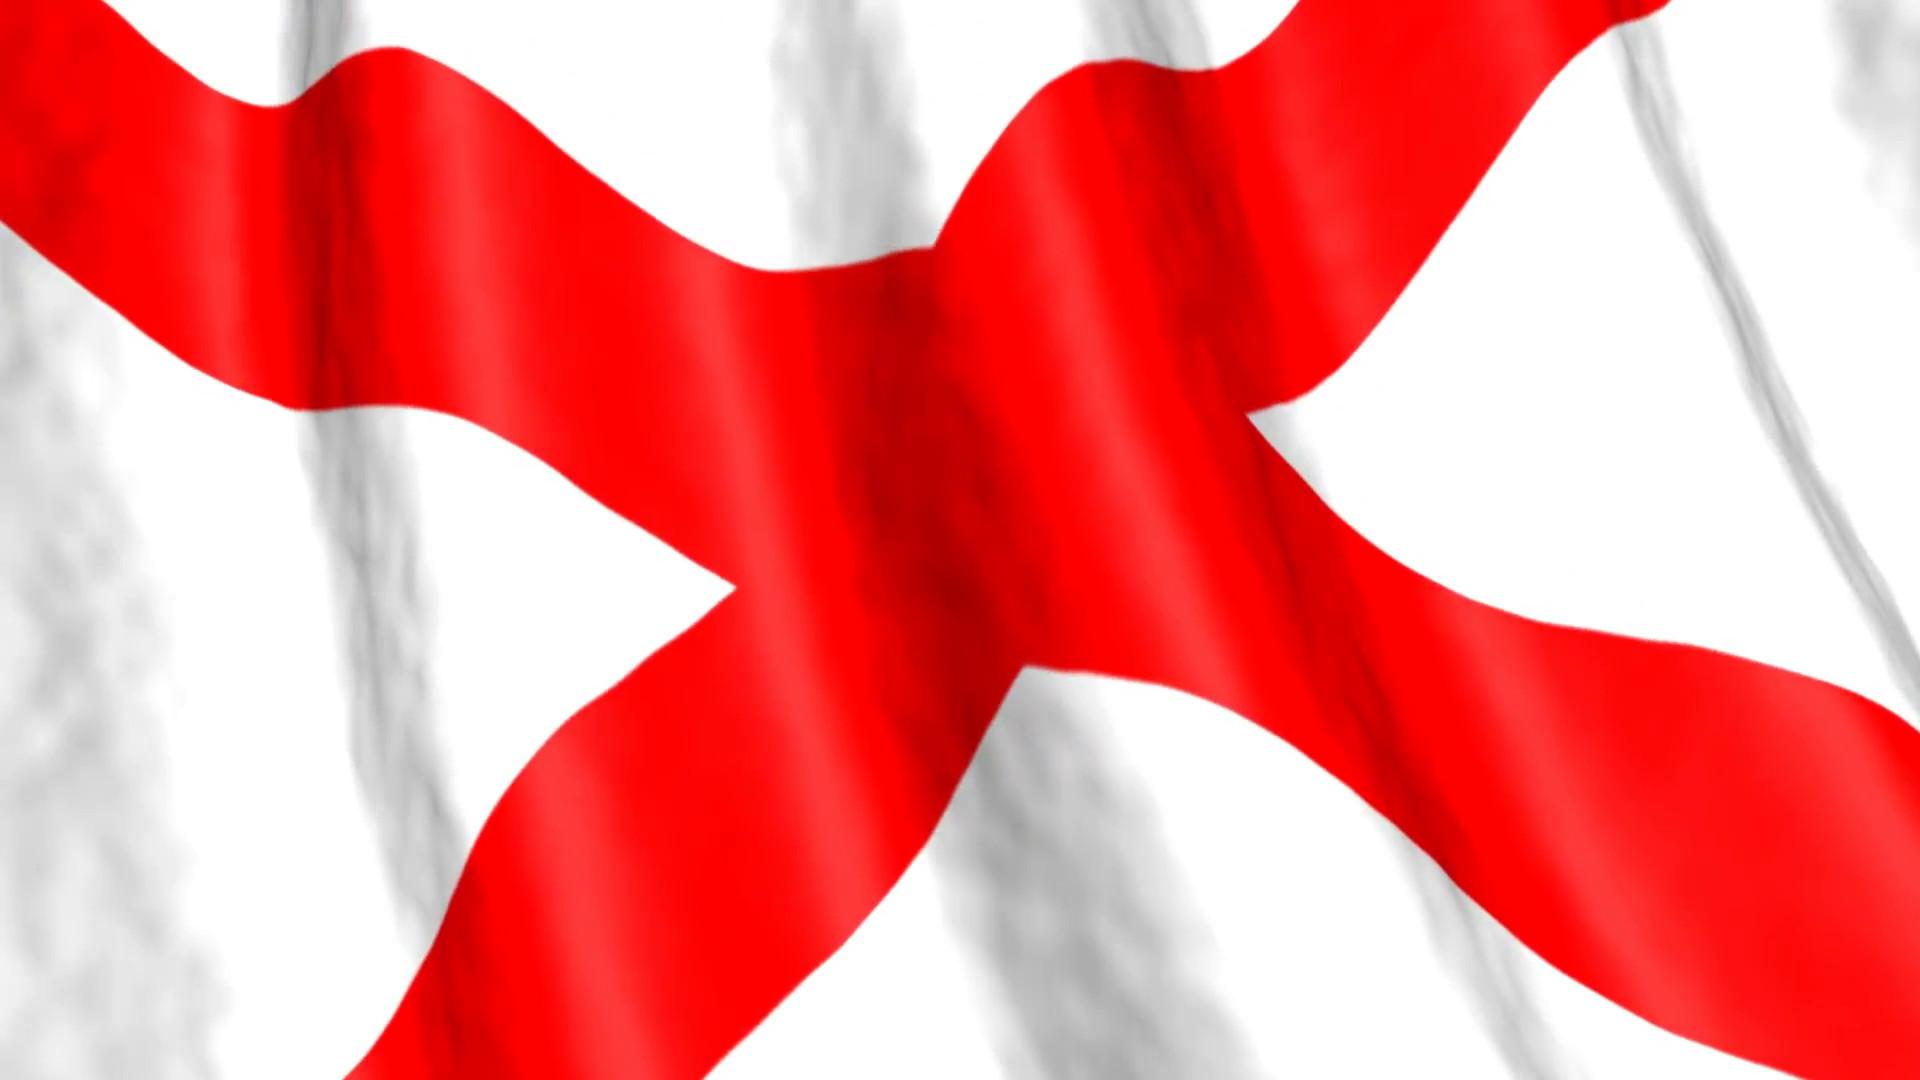 flag background images  u00b7 u2460